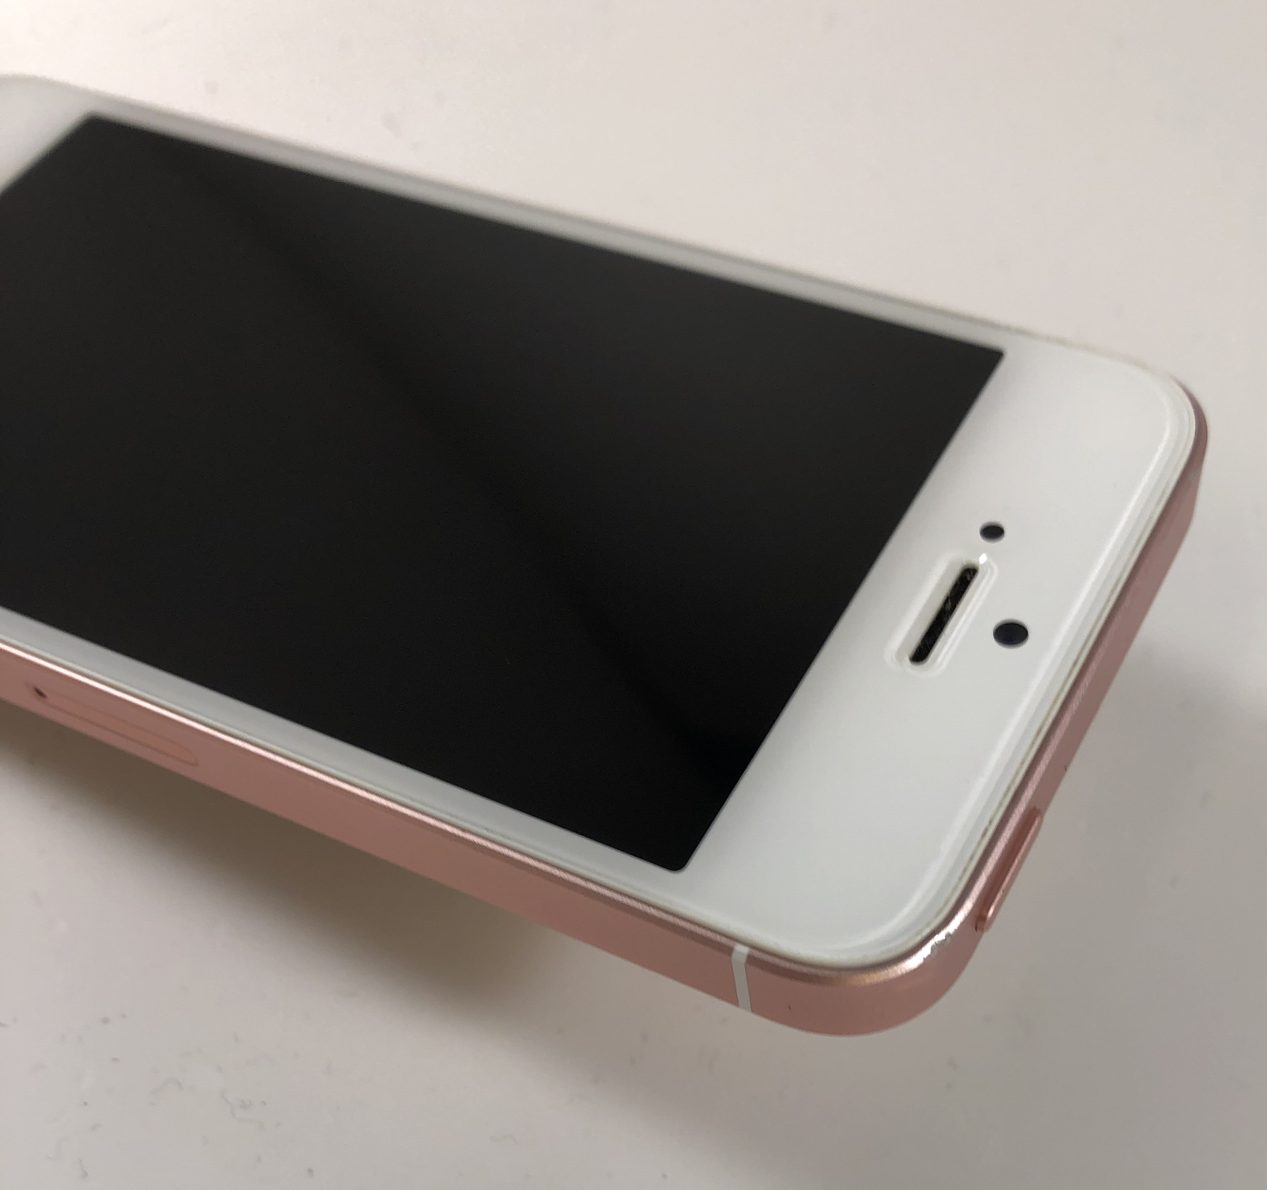 iPhone SE 16GB, 16GB, Rose Gold, Afbeelding 3